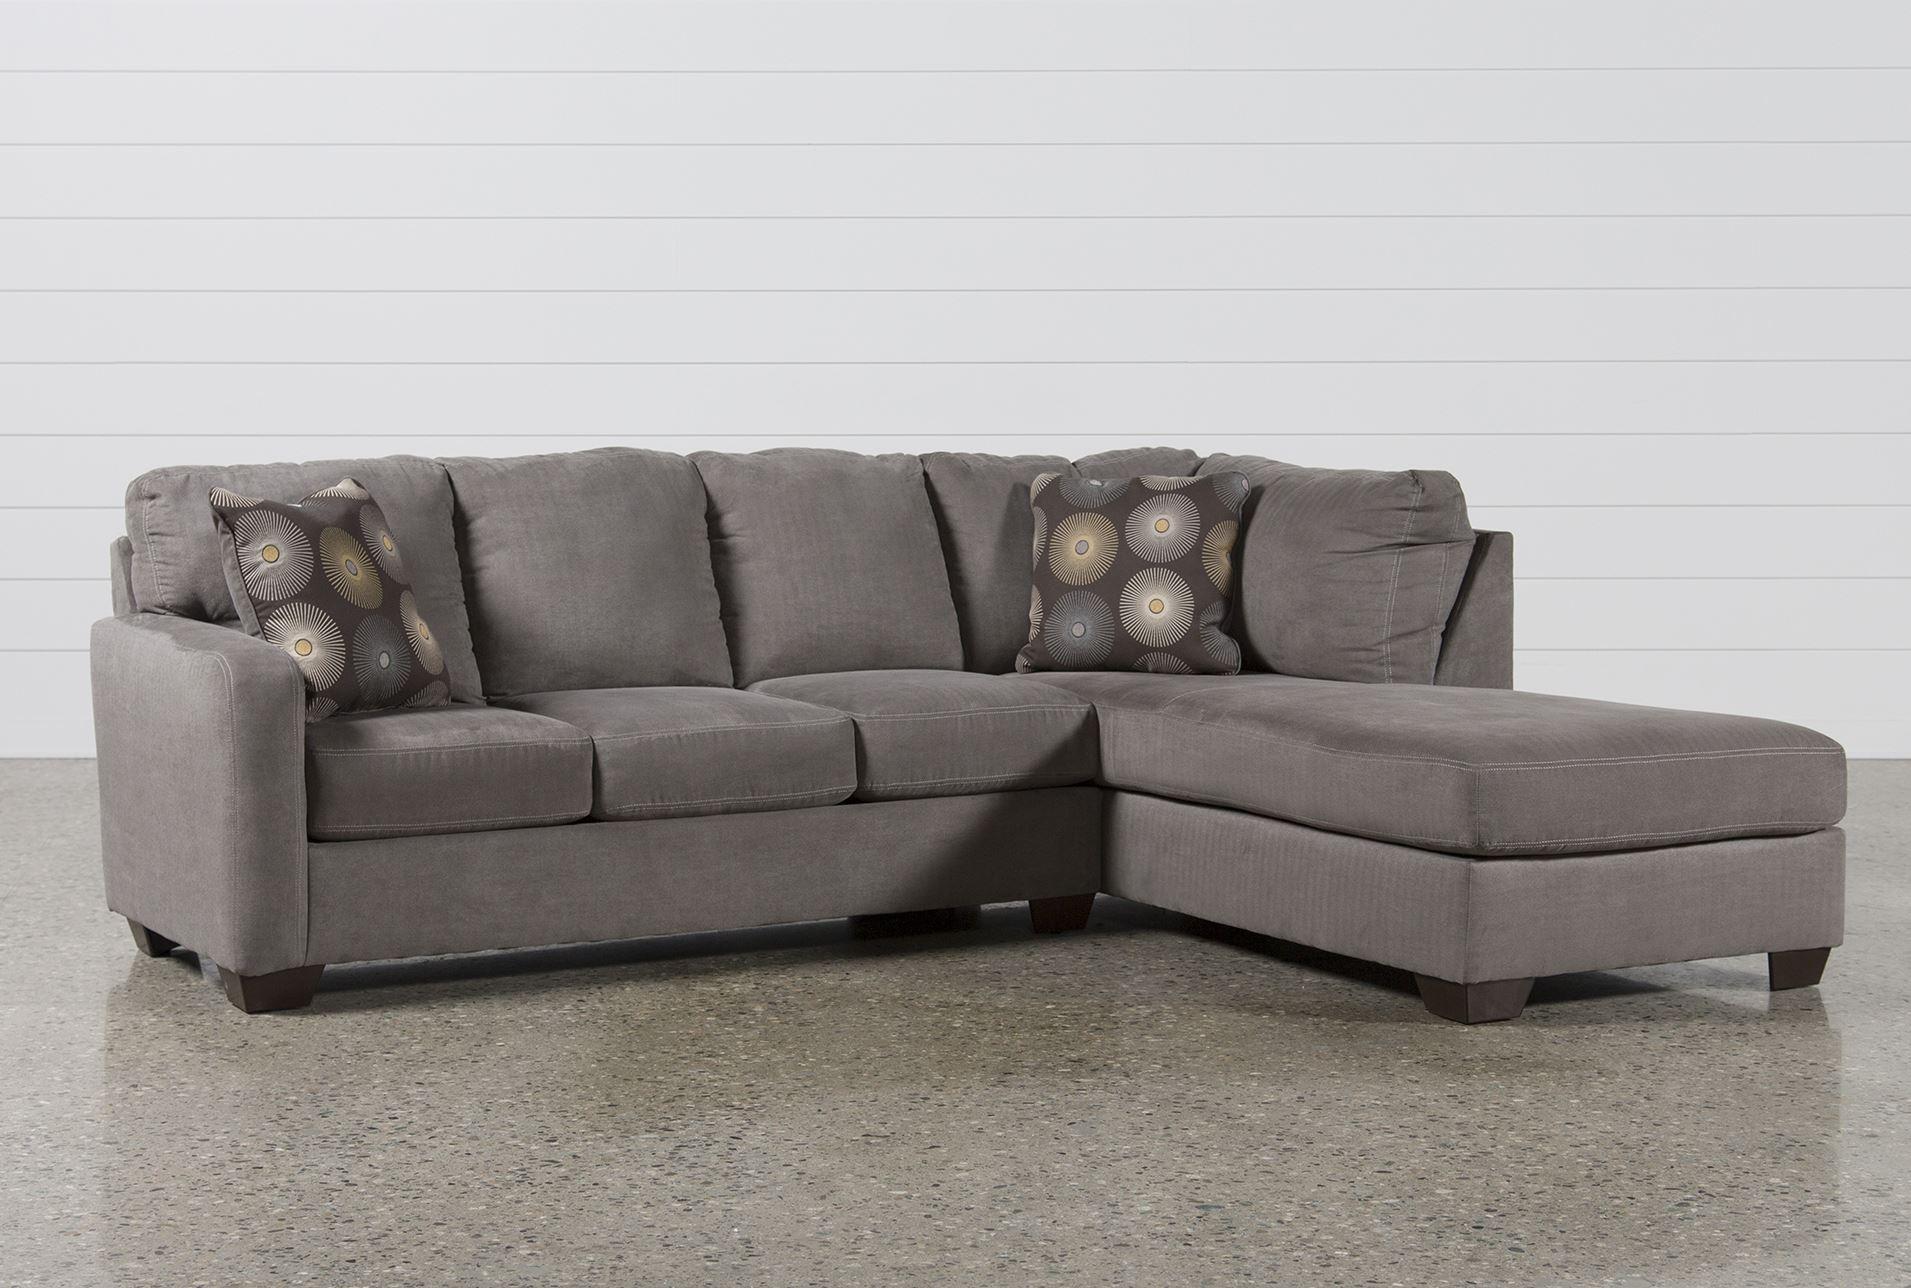 Long Sectional Sofa Toronto | Tehranmix Decoration Pertaining To Leather Sectional Sofas Toronto (View 11 of 20)